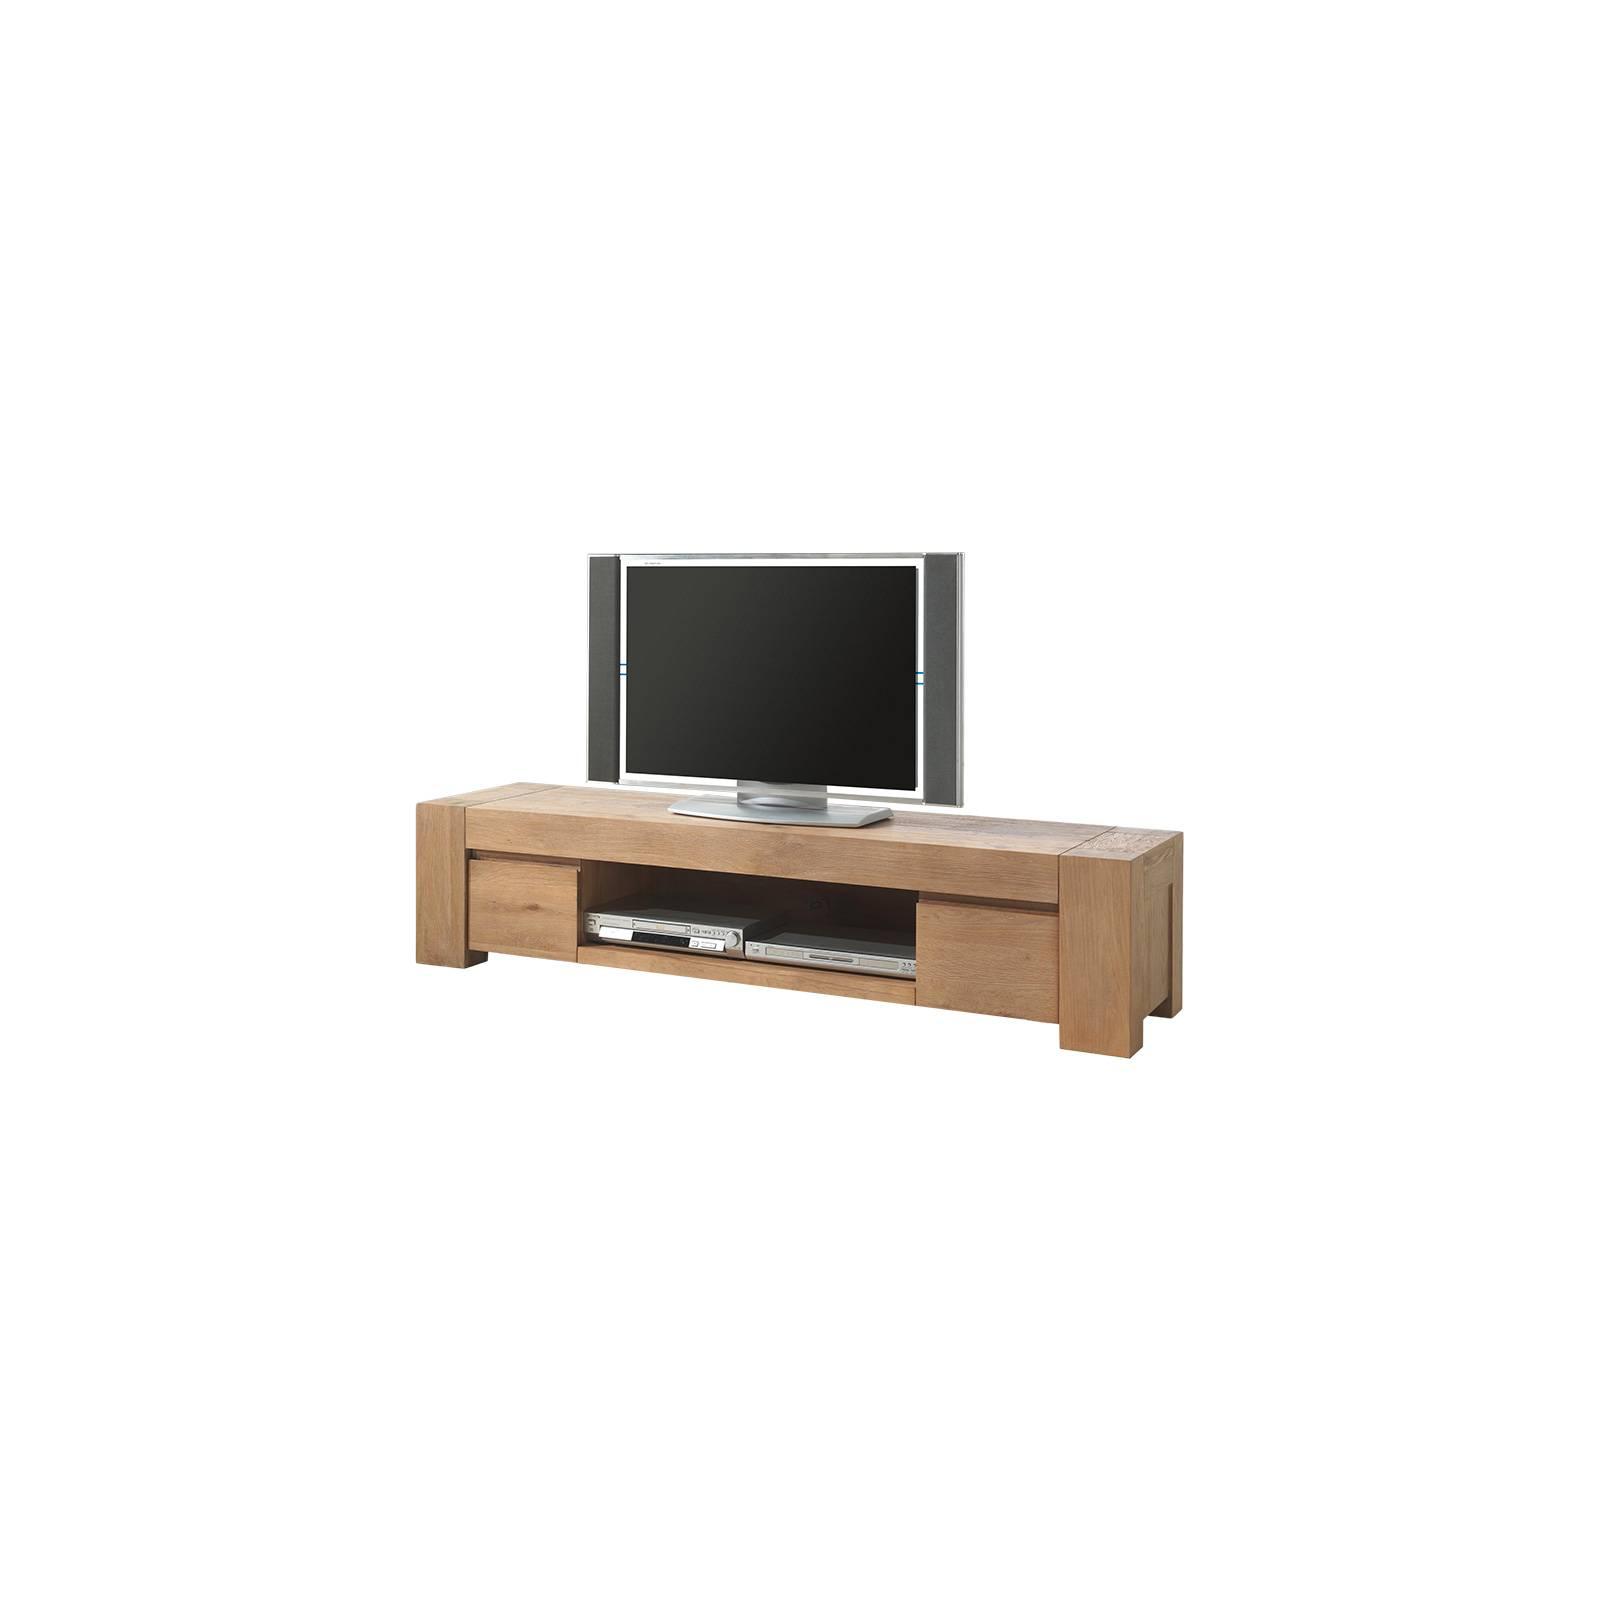 Meuble Tv Zeus Chêne - meuble haut de gamme